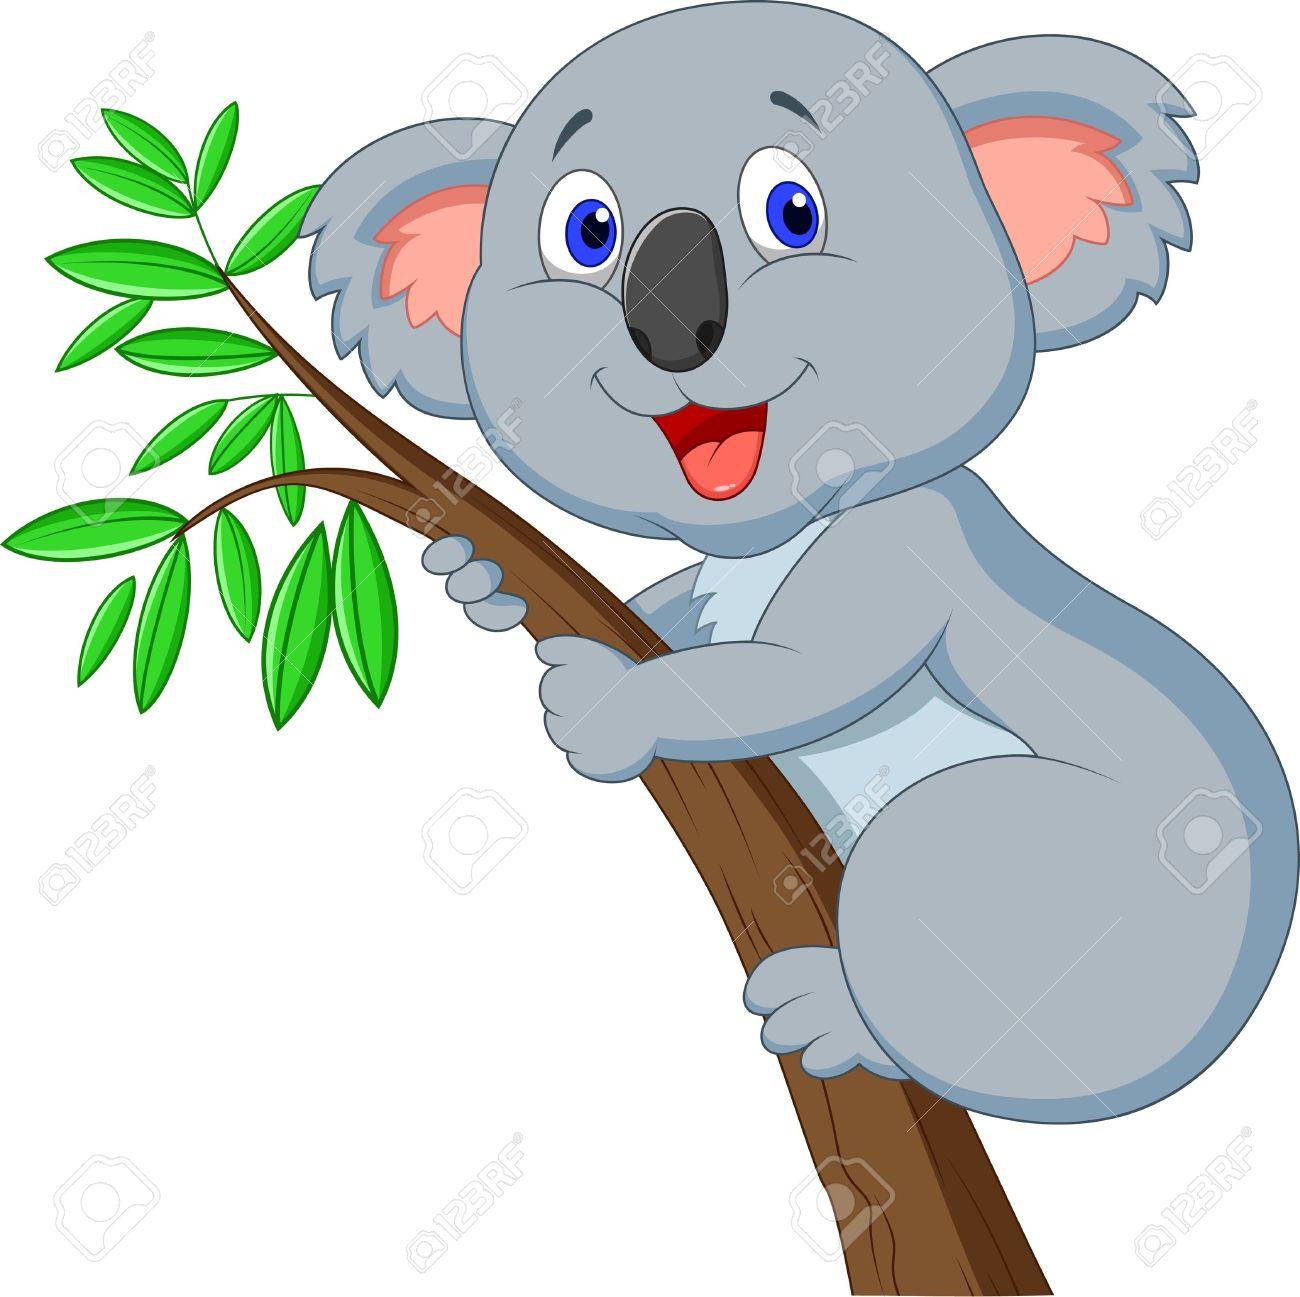 Koala Bear clipart #5, Download drawings